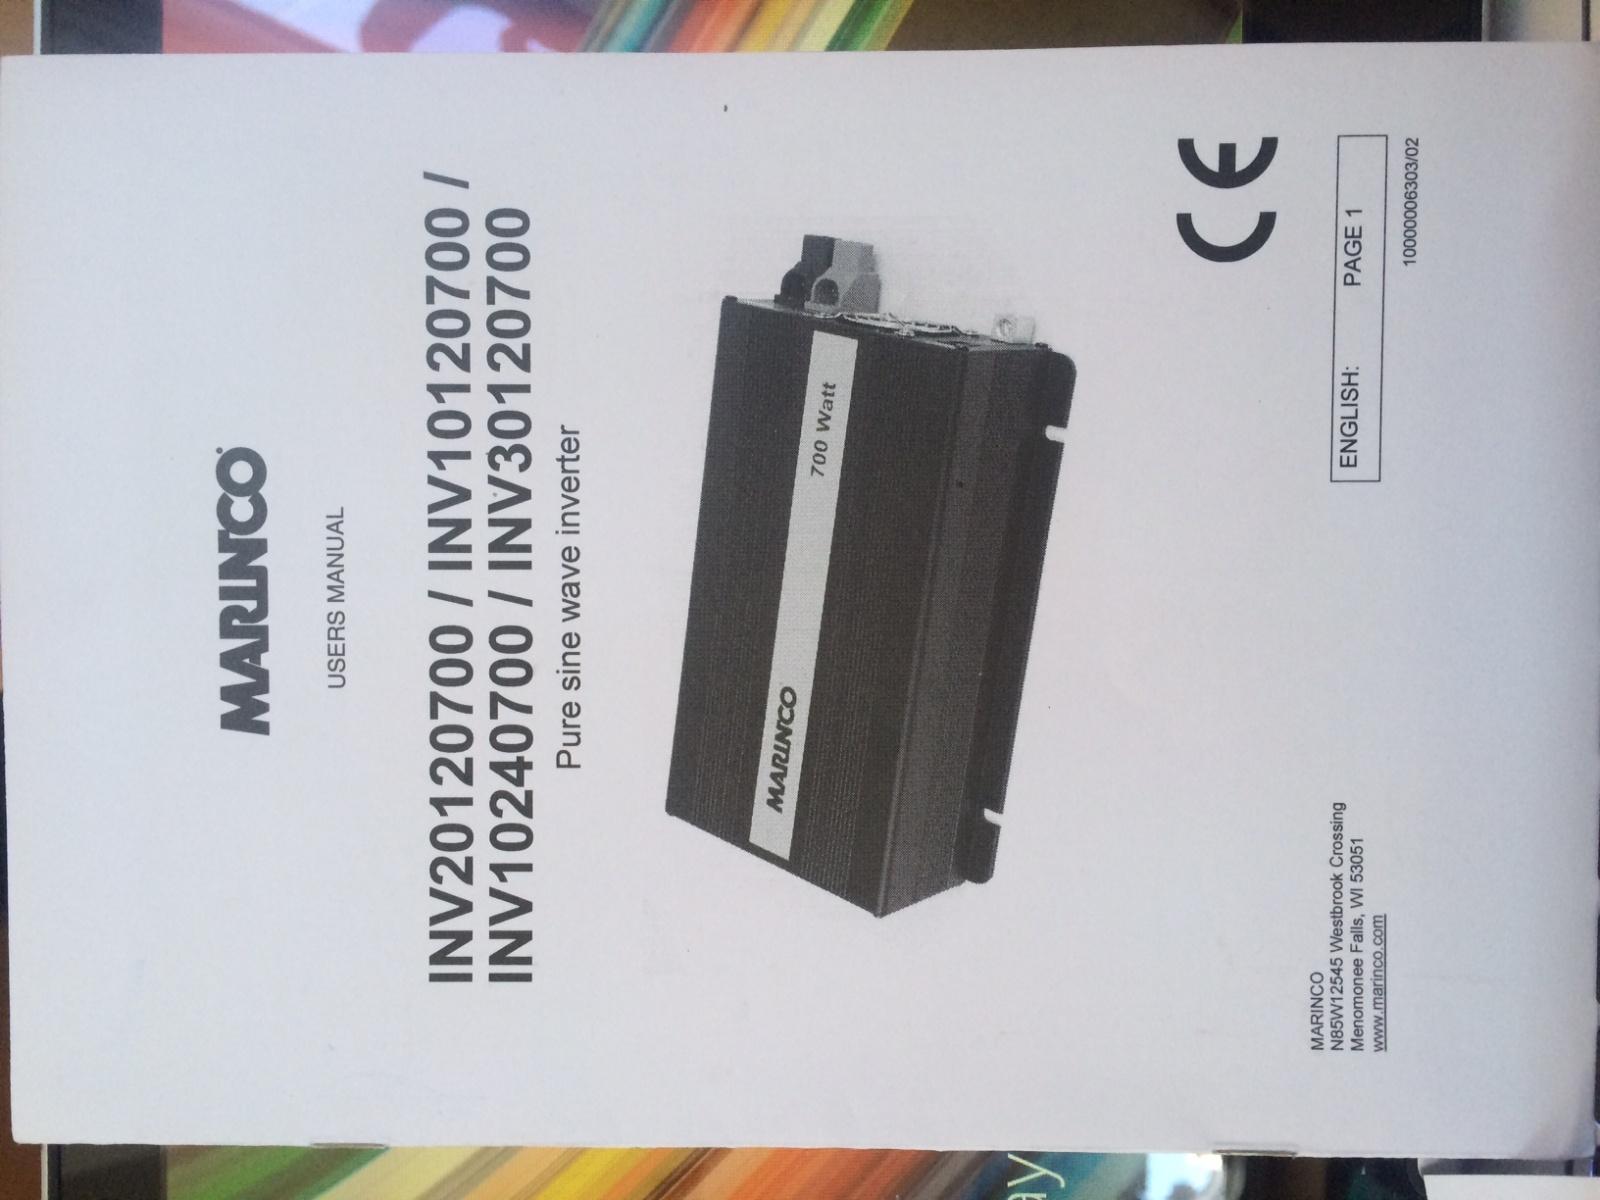 Click image for larger version  Name:Inverter Manual.jpg Views:129 Size:370.1 KB ID:99836